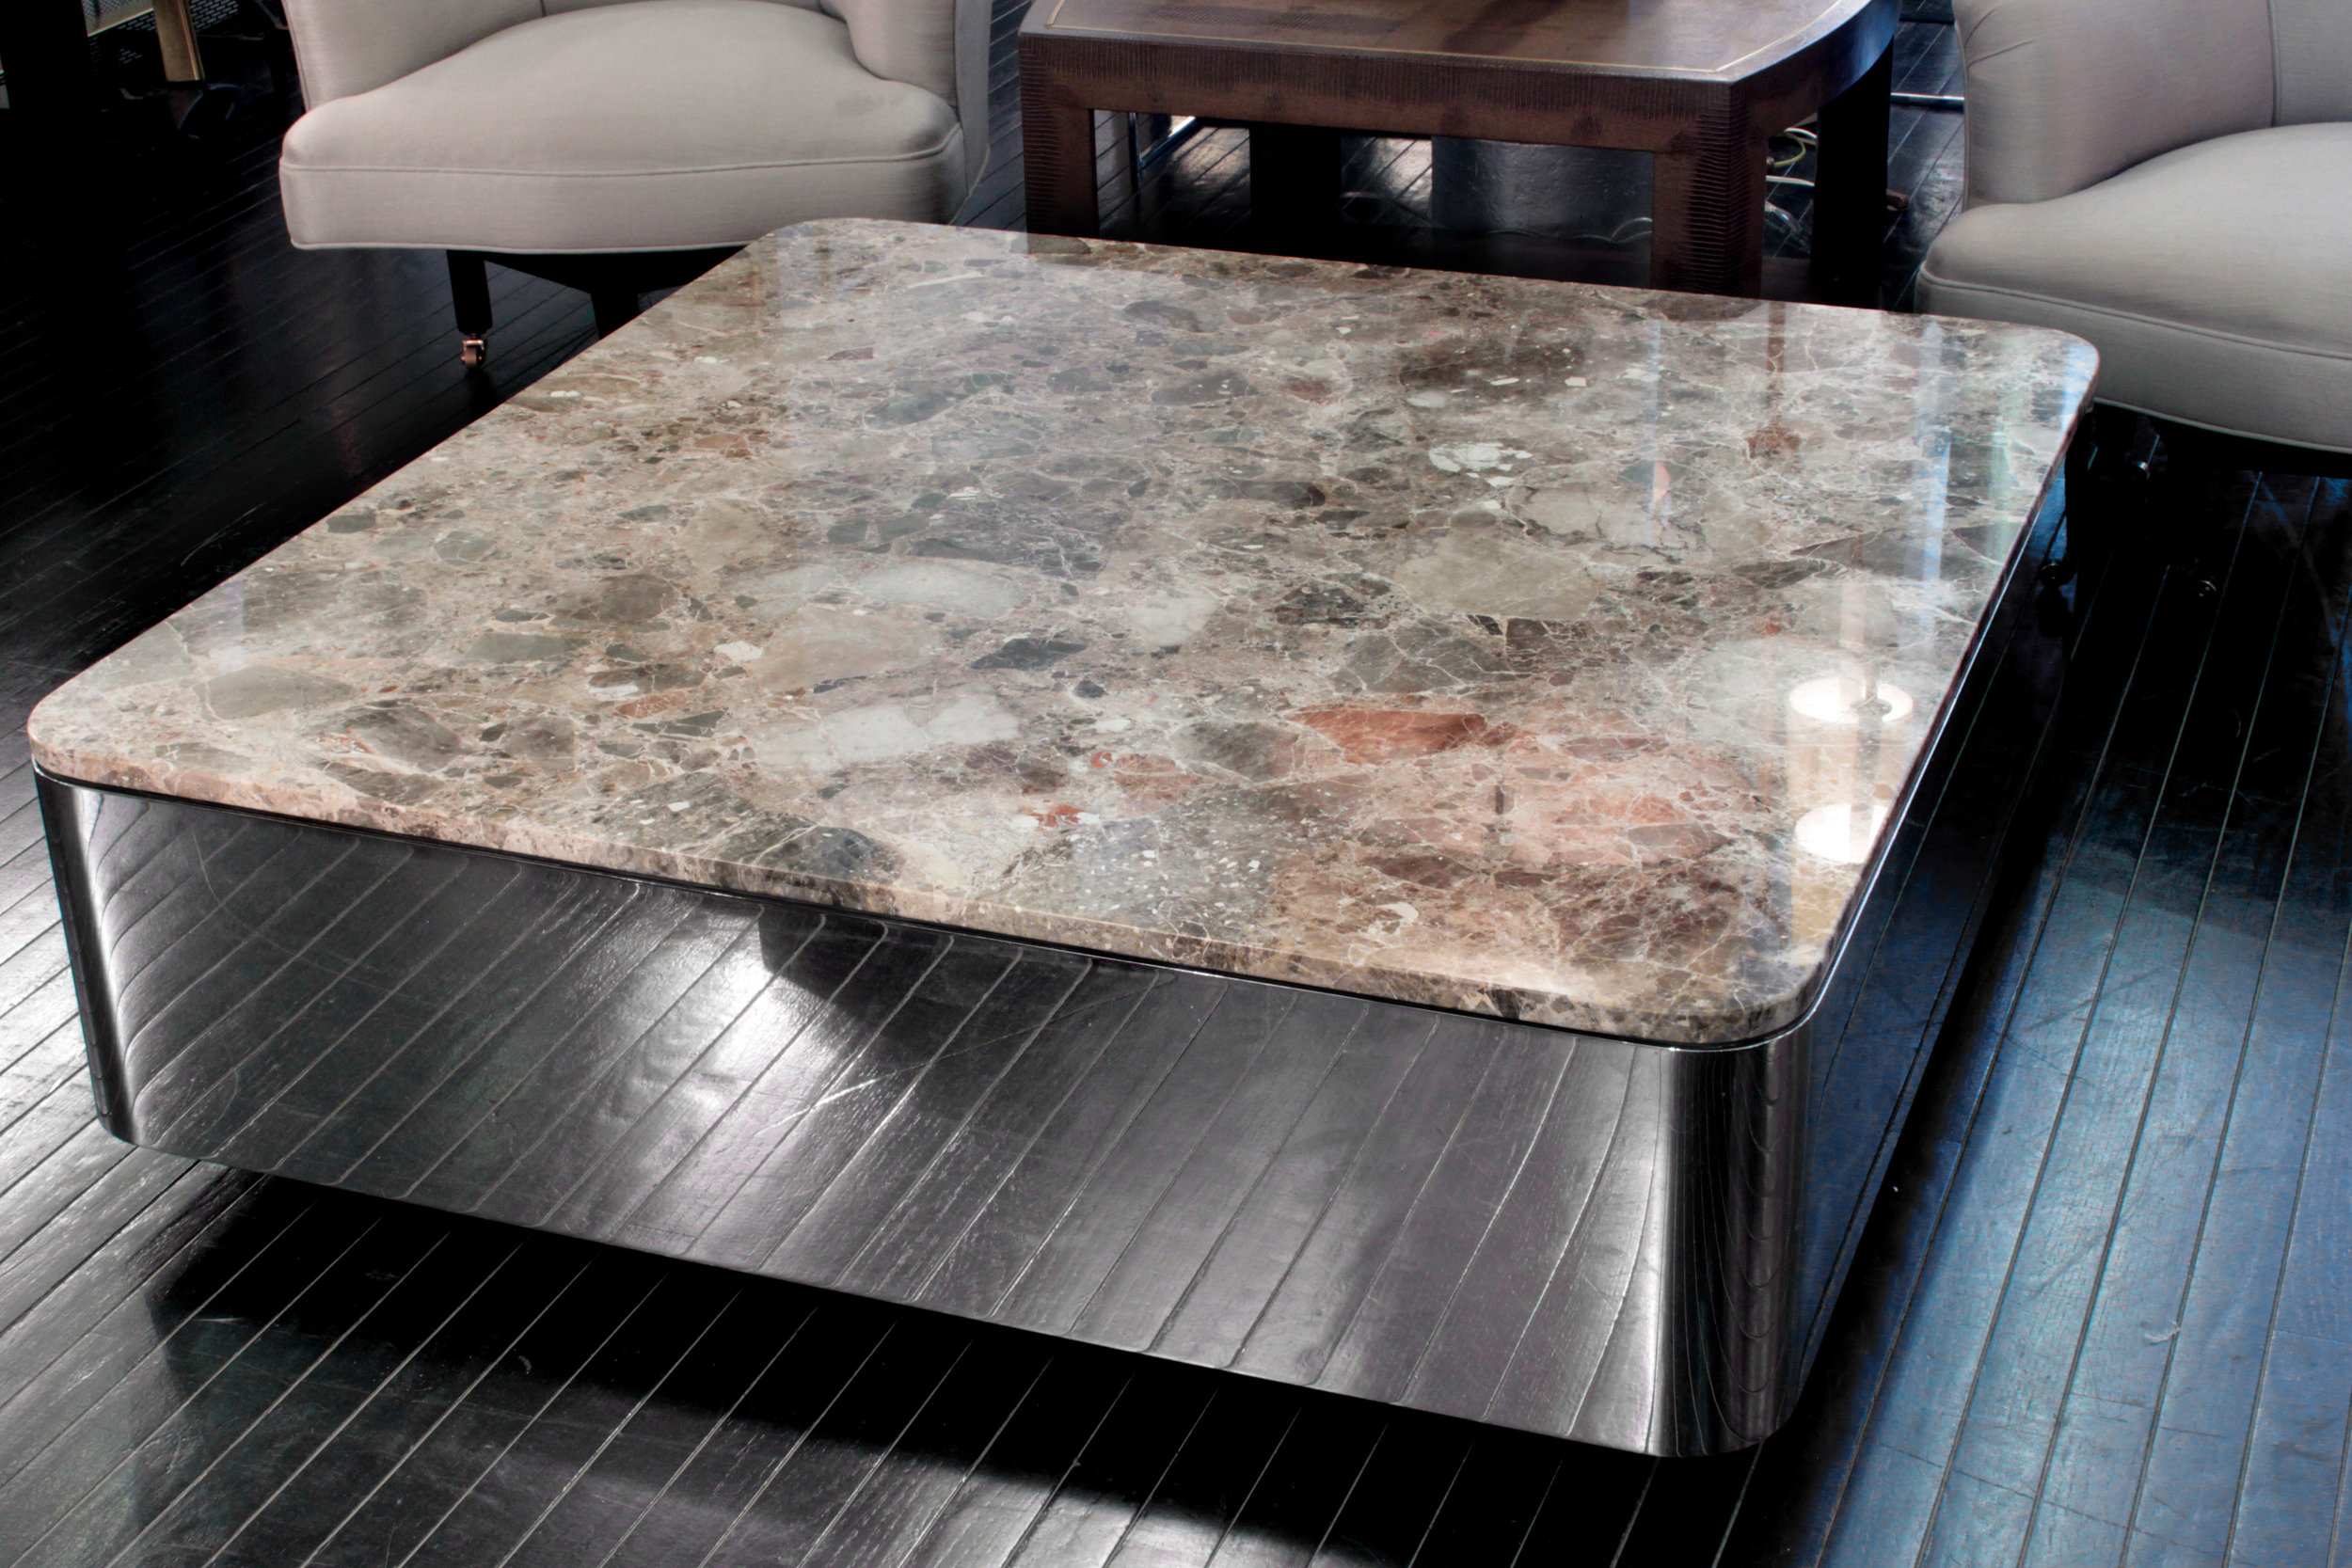 Brueton 85 polished steel+marble coffeetable75 detail5 hires.JPG